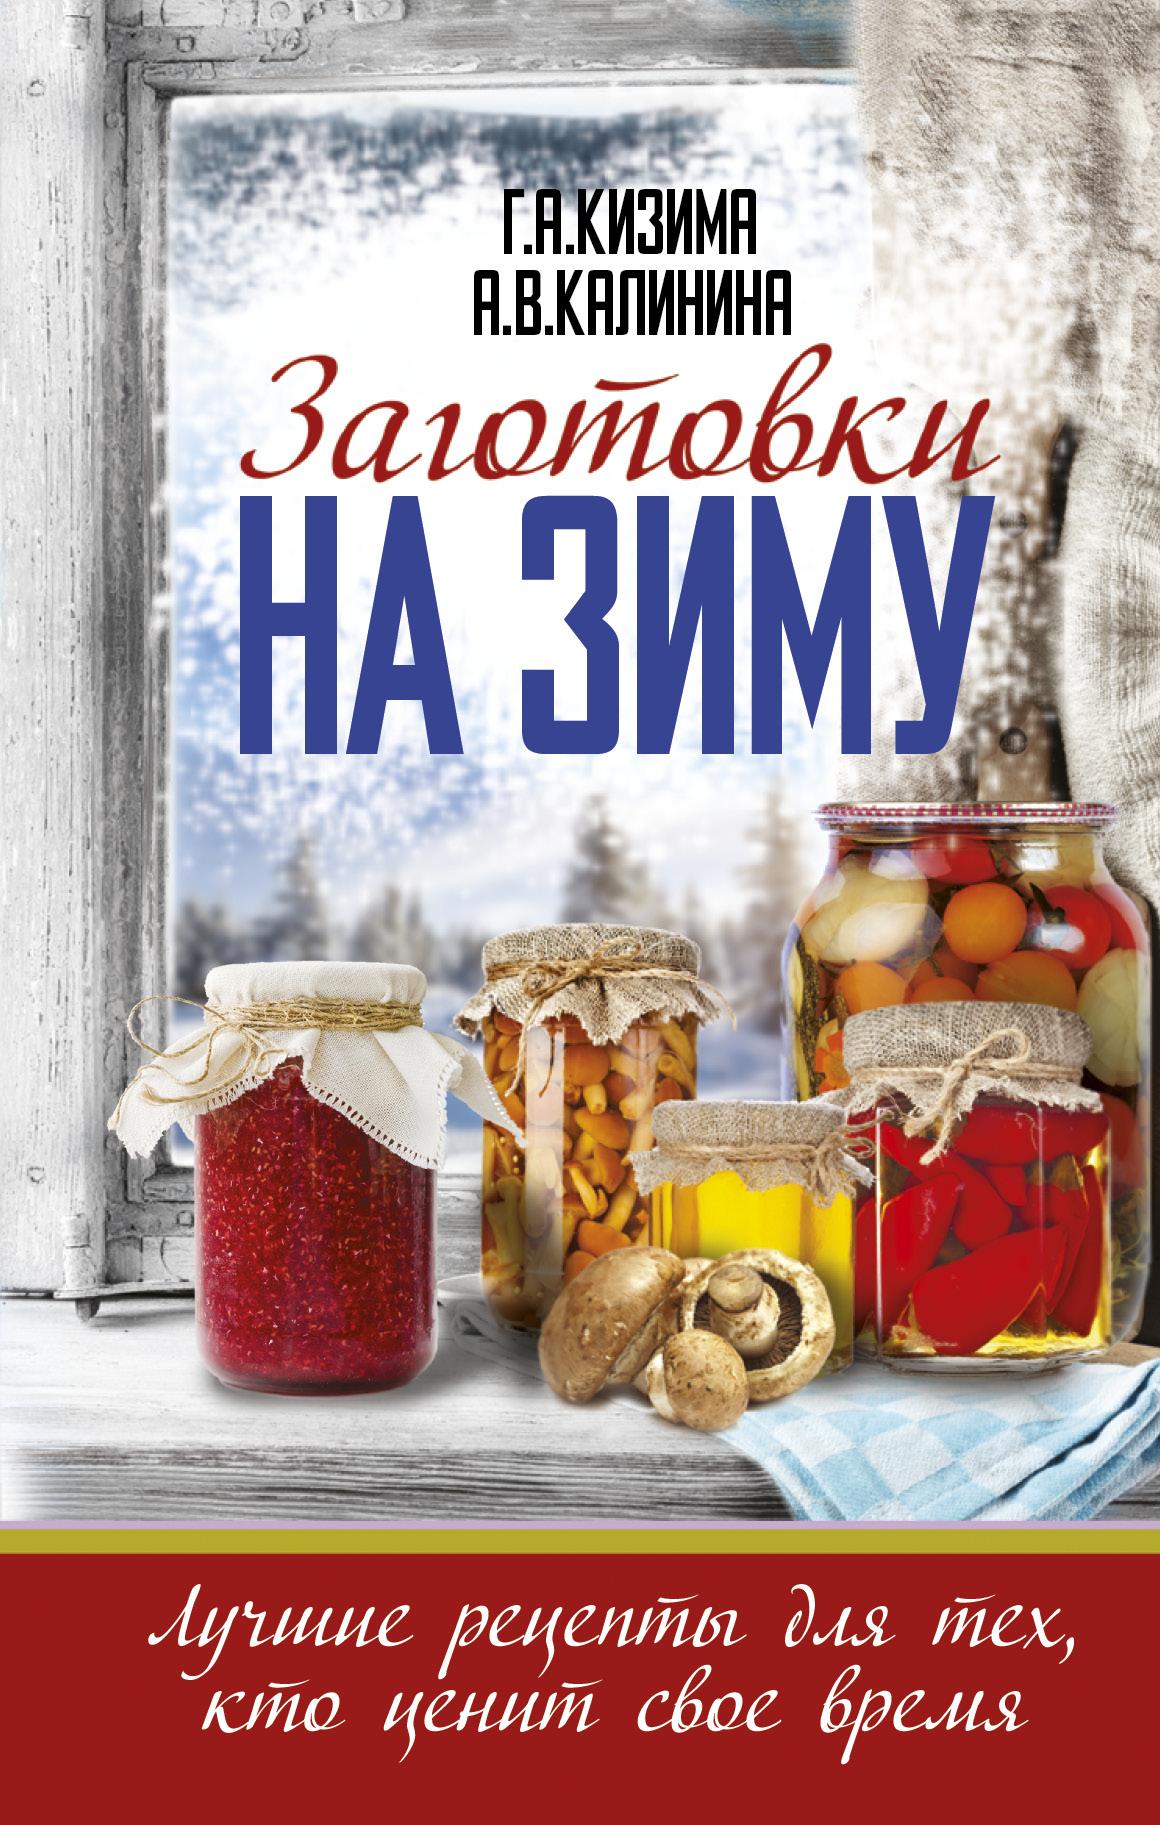 Кизима Г.А., Калинина А.В. Заготовки на зиму. Лучшие рецепты для тех, кто ценит свое время кизима г заготовки на зиму лучшие рецепты для тех кто ценит время 32 наклейки на банки